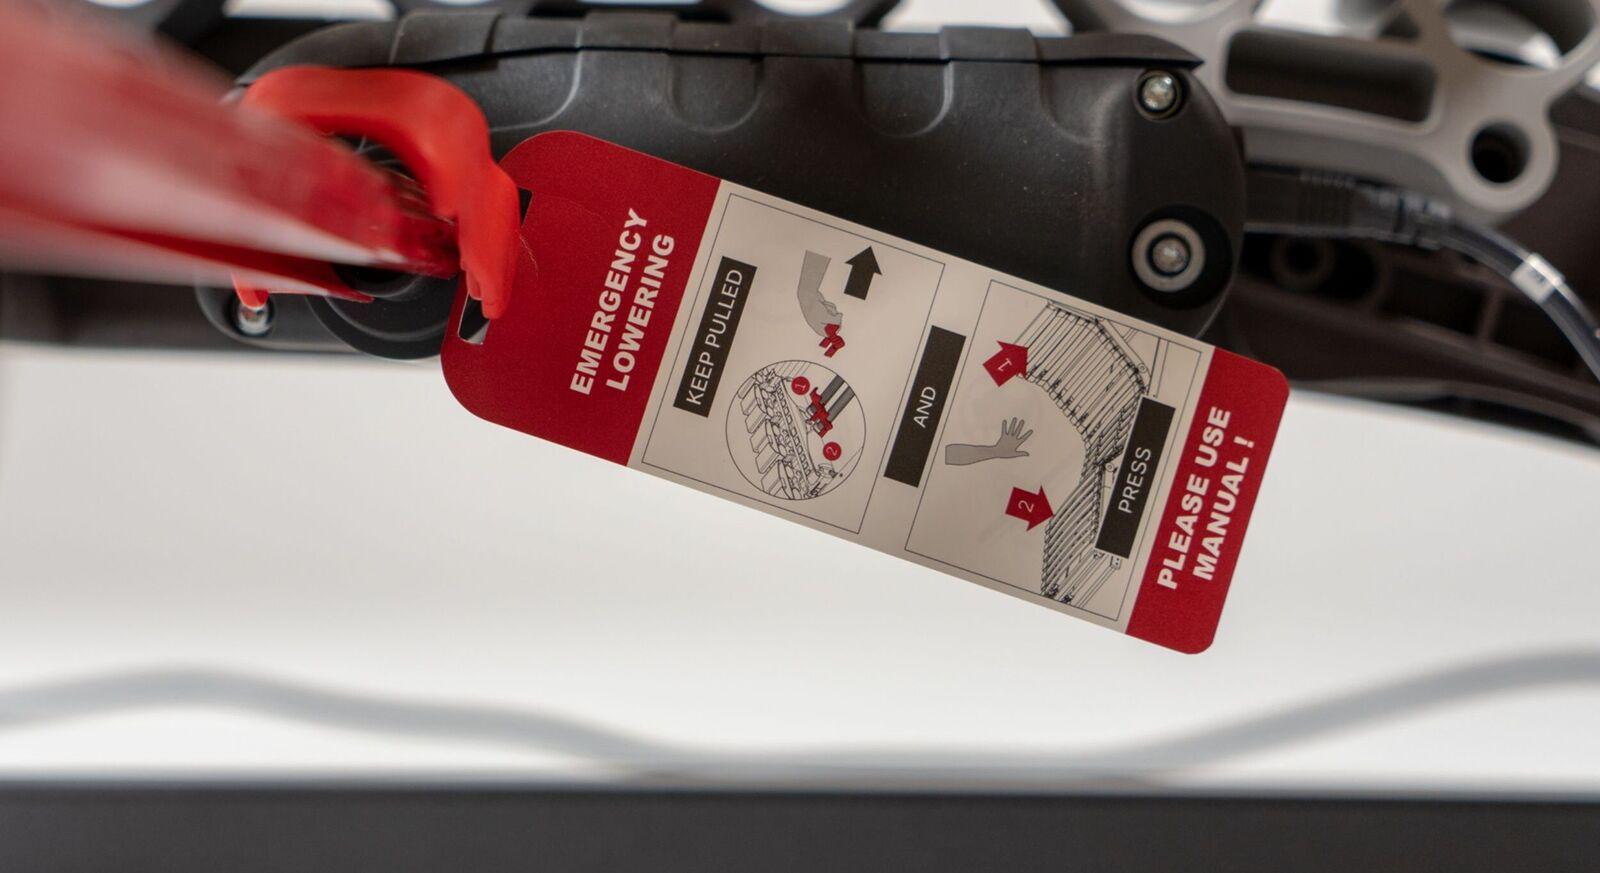 Lattenrost orthowell royalflex XL motor mit Notfall-Absenkung